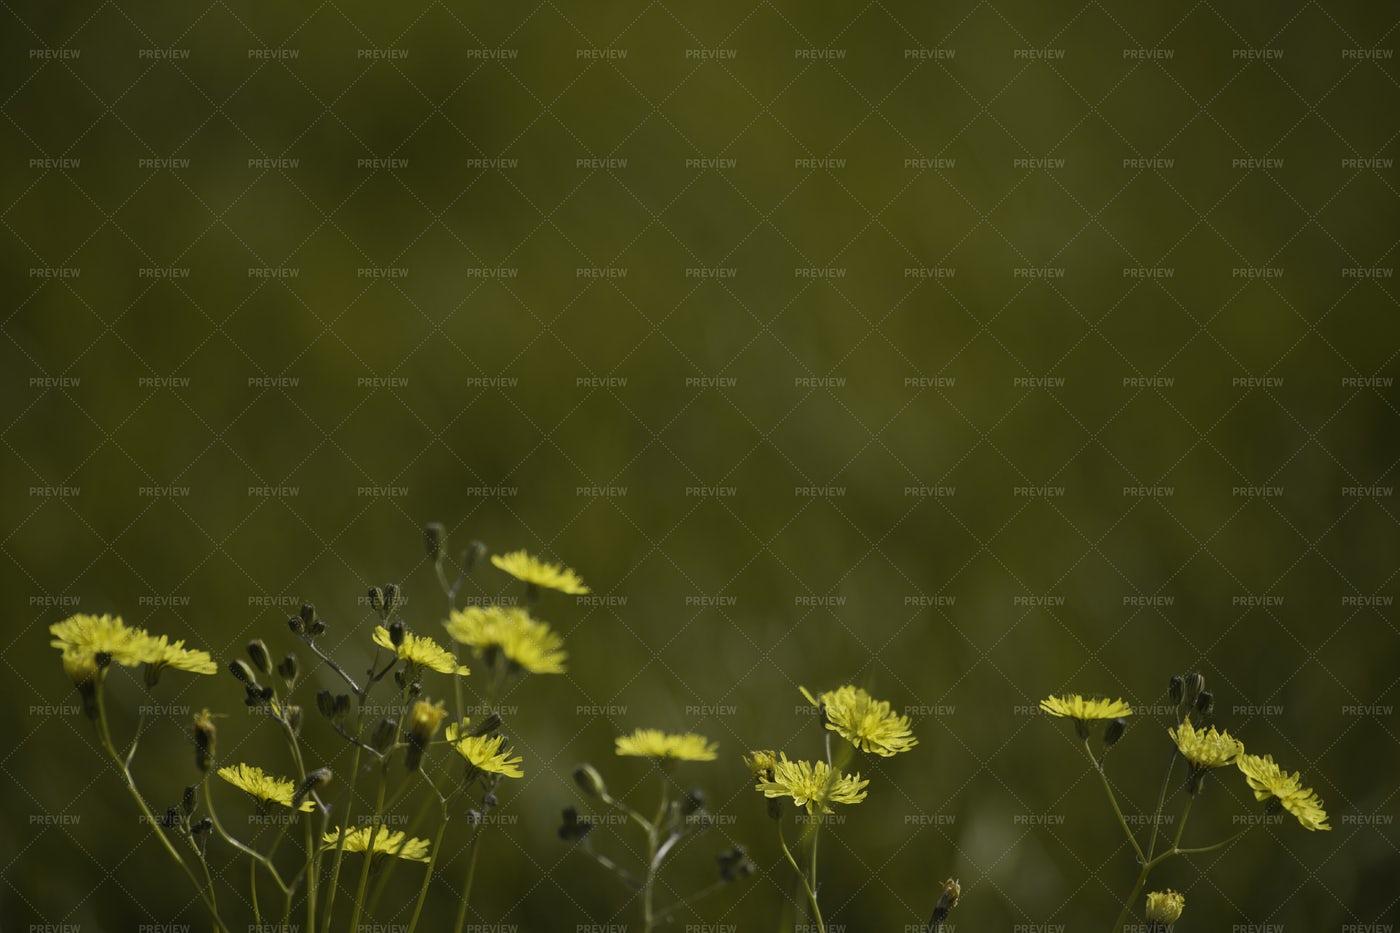 Yellow Dandelions On Green Grass: Stock Photos